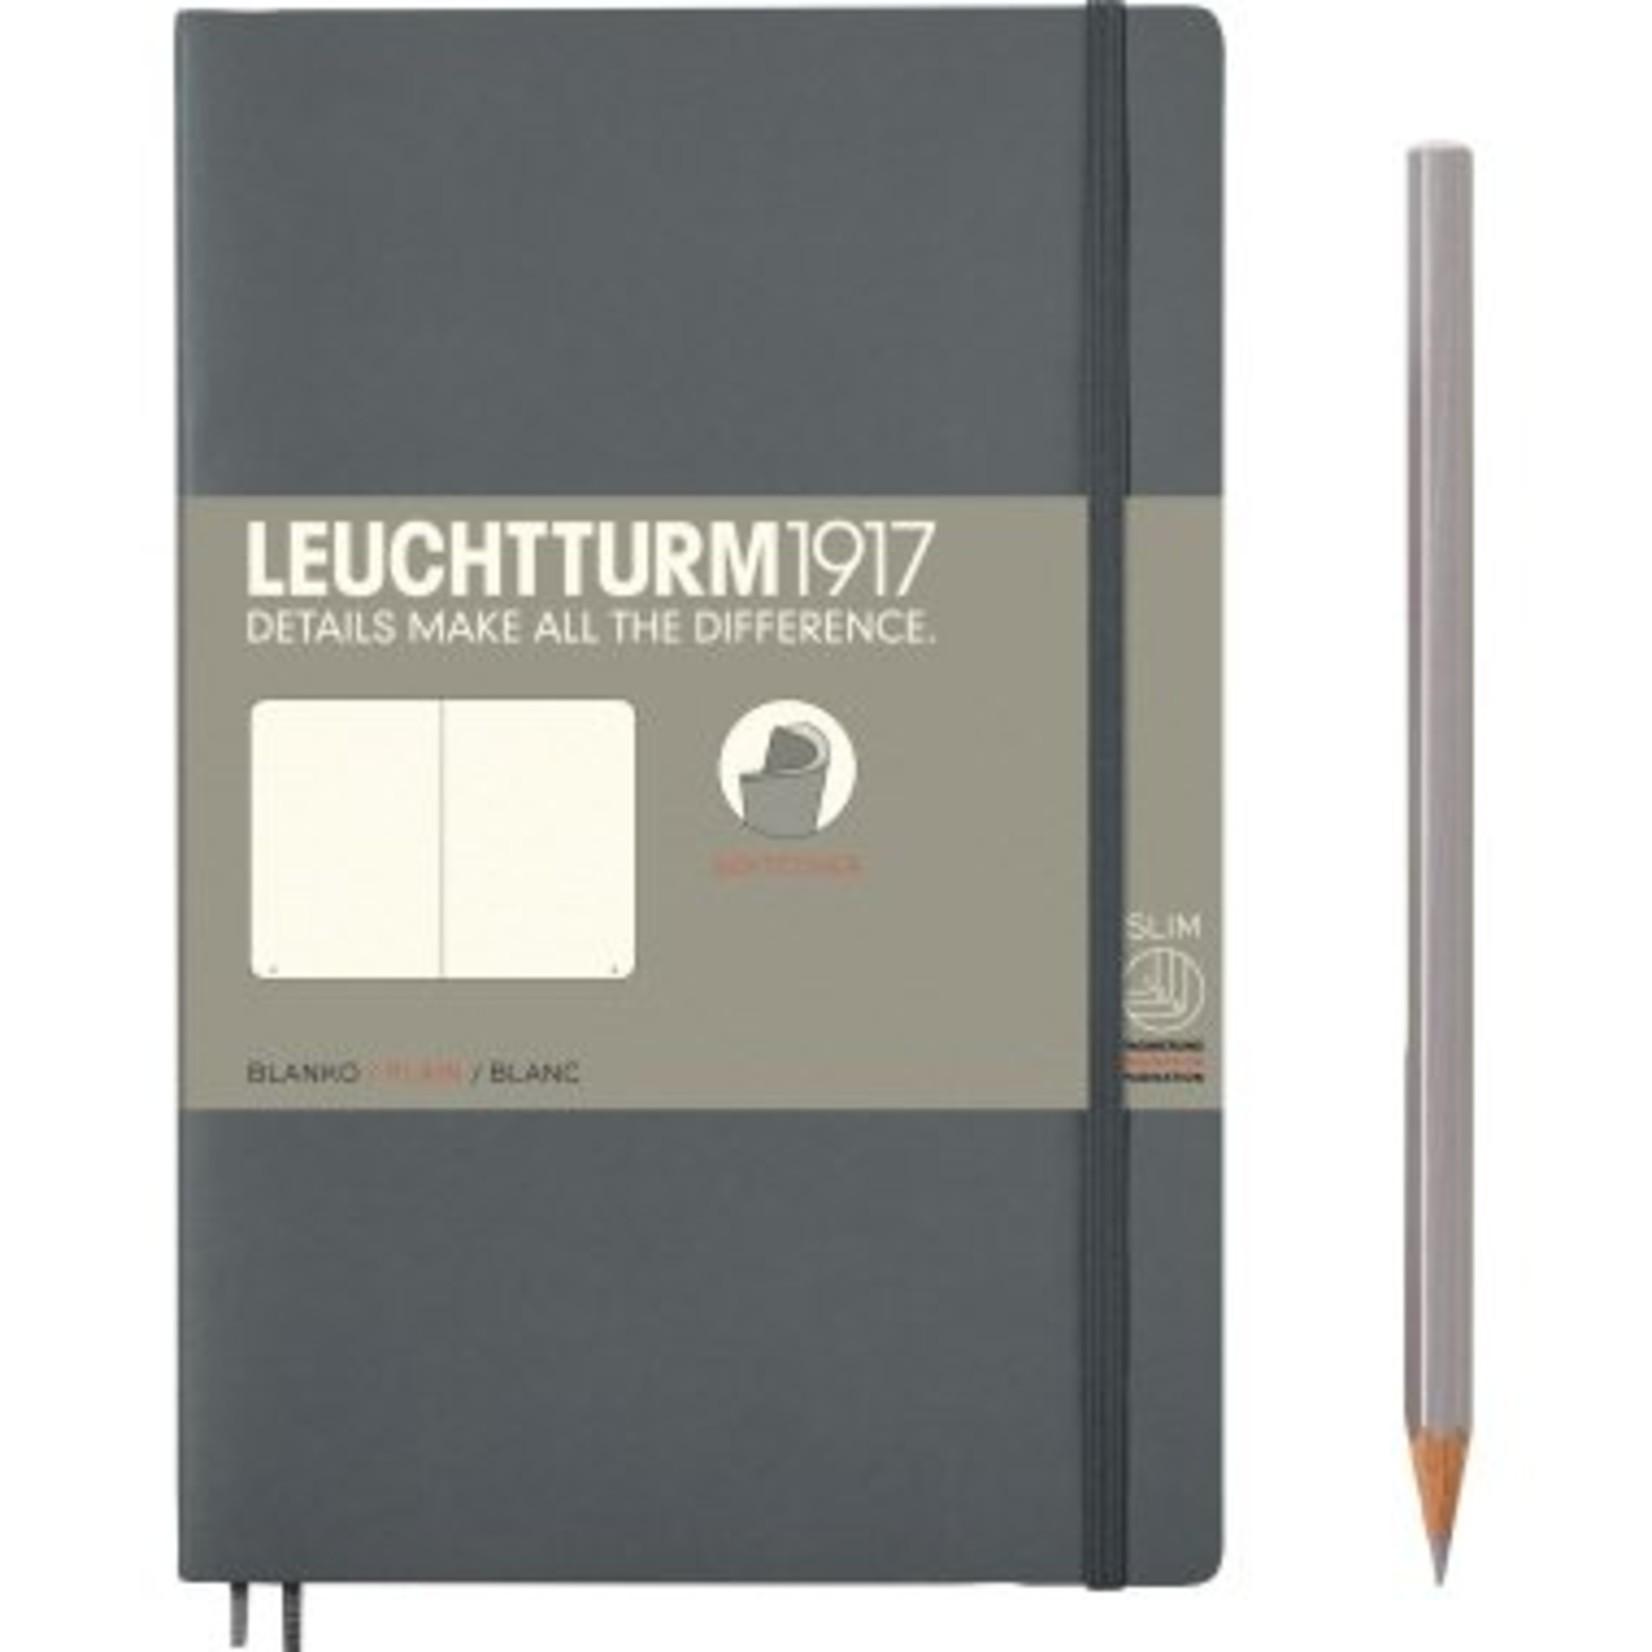 Leuchtturm1917 LT NB B6 SC Paperback Anthrazit Blanko